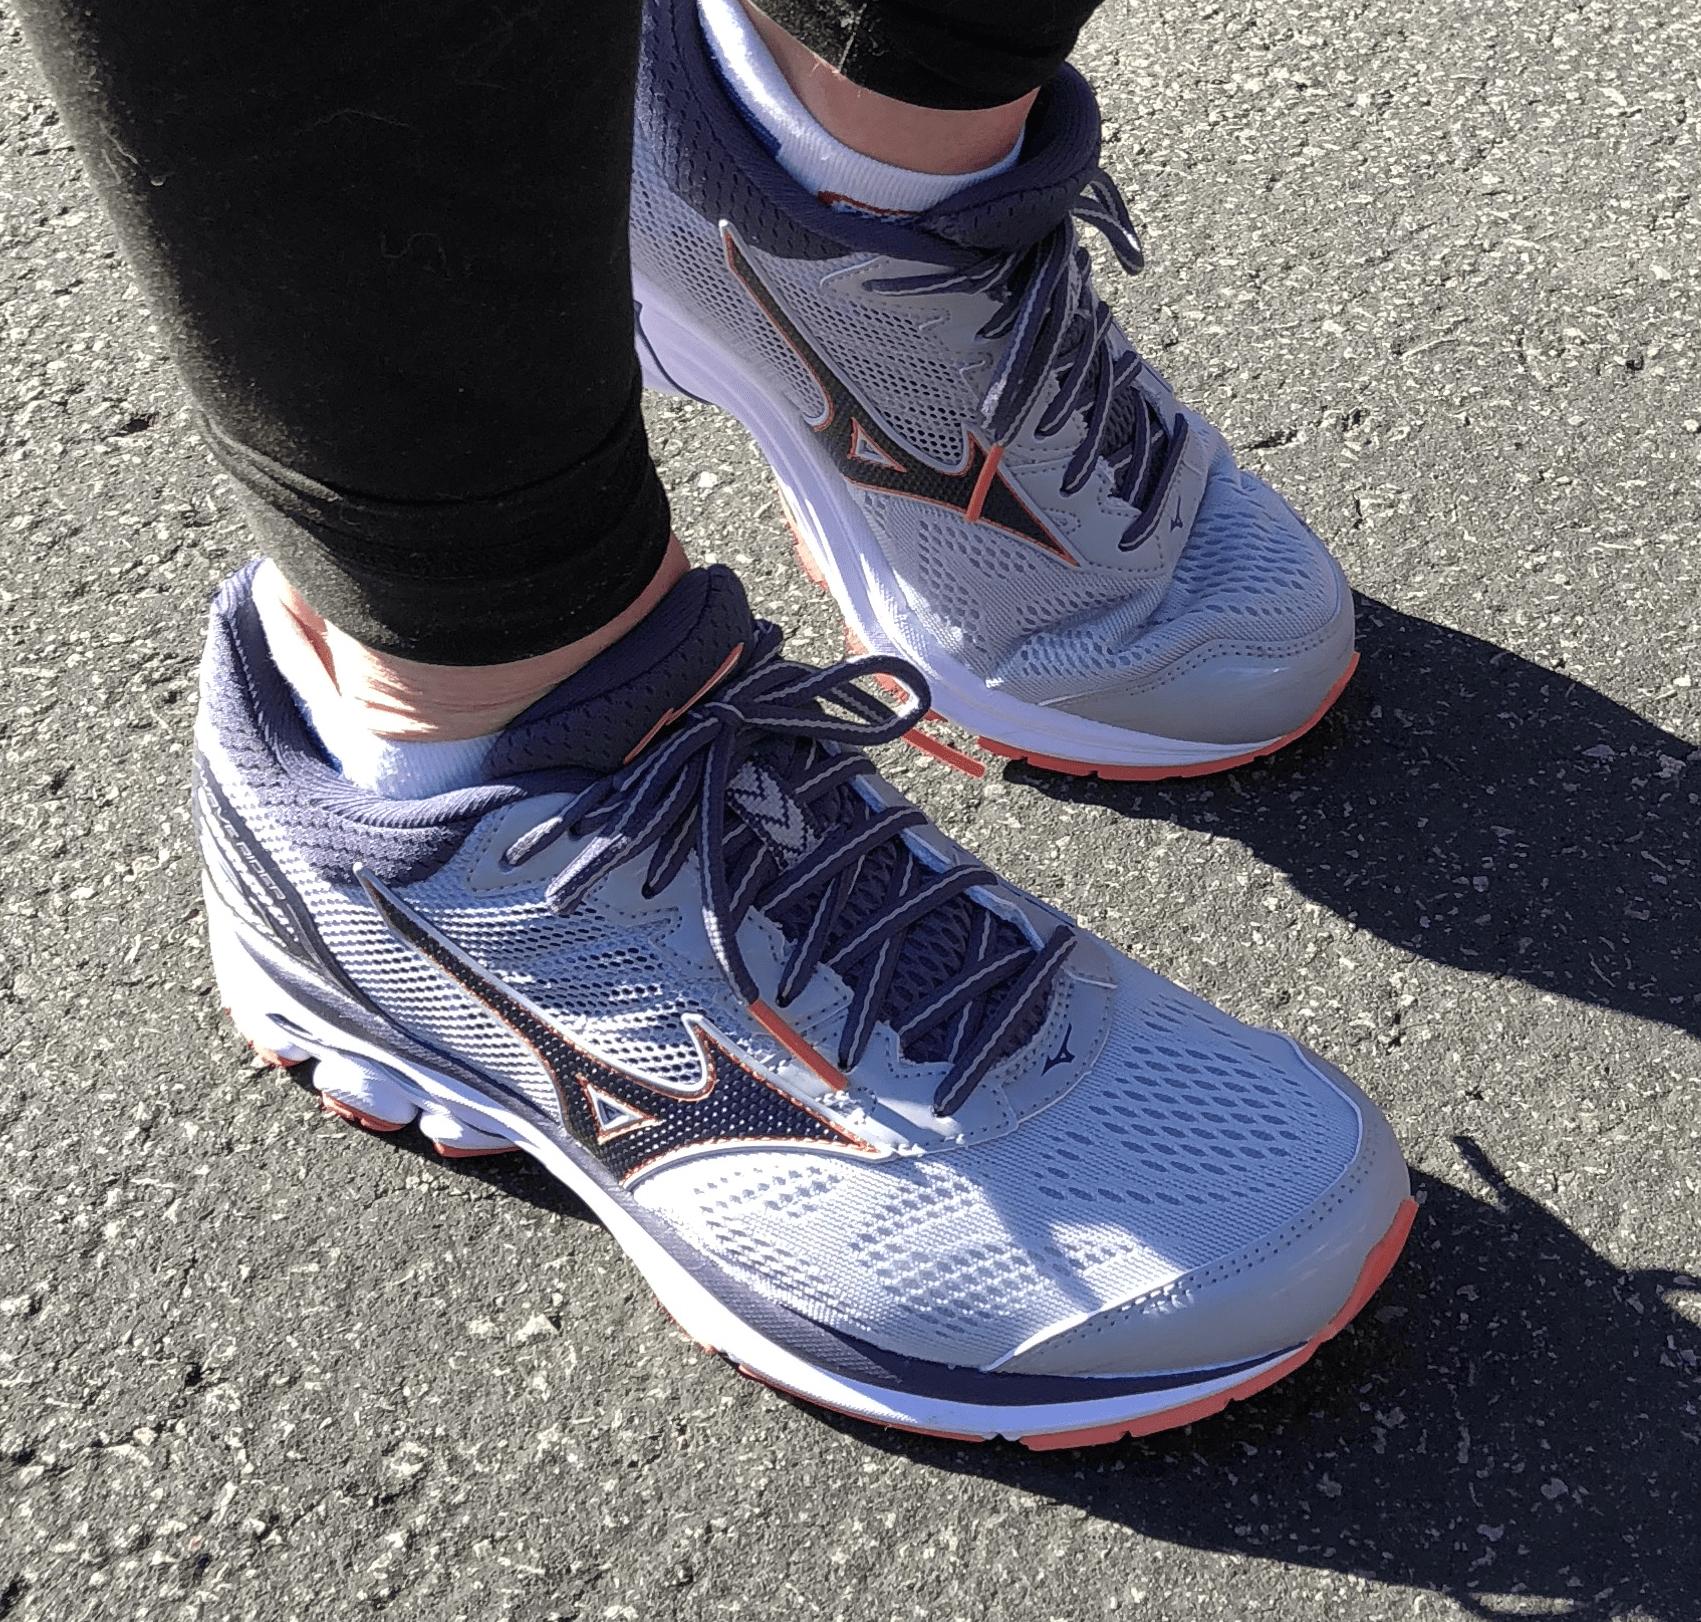 Training for Next Half Marathon with Mizuno Wave Rider 21 Shoes